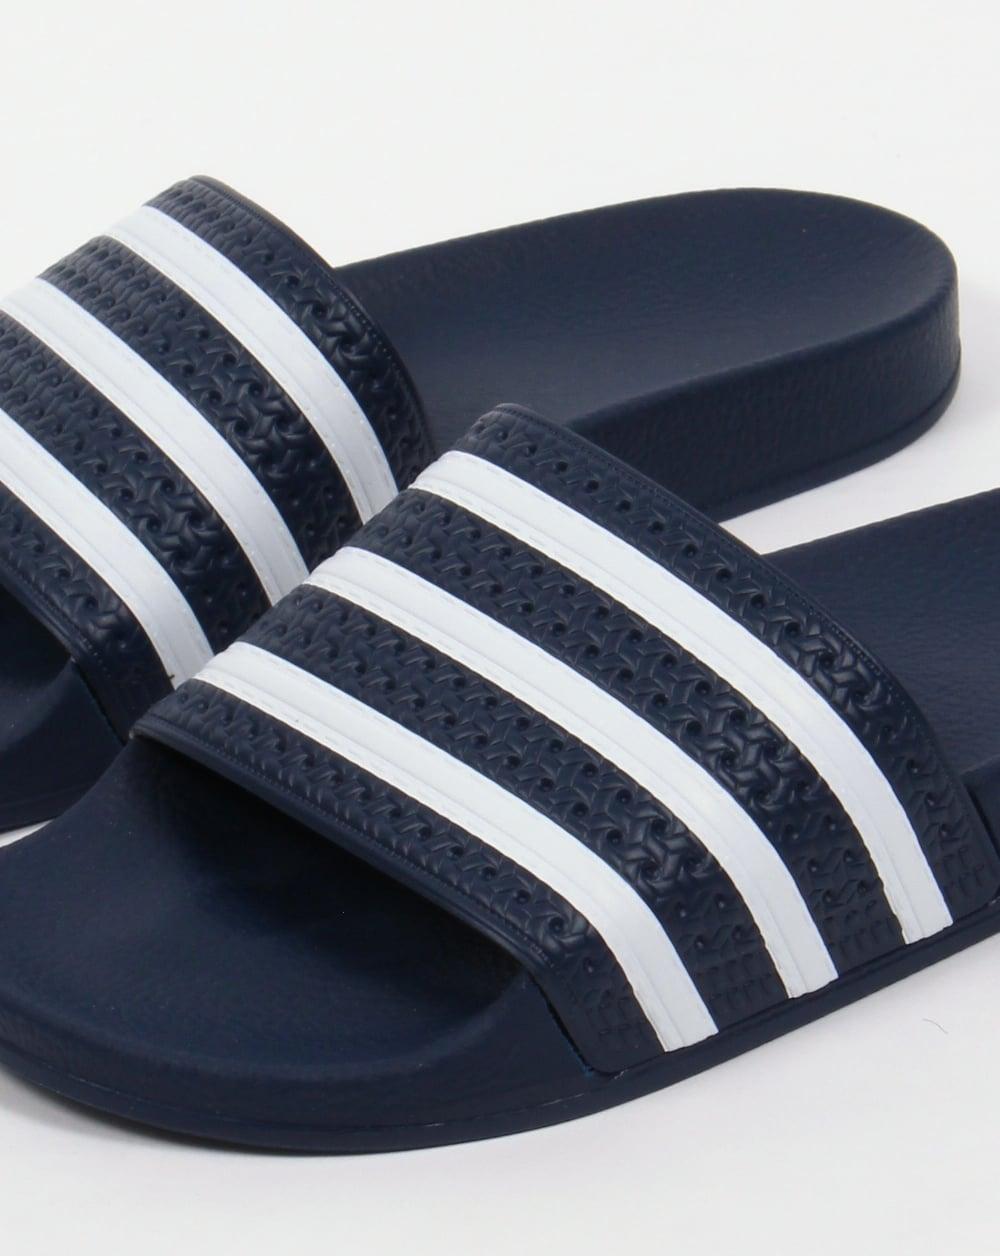 Adidas Adilette Slides Navy/White